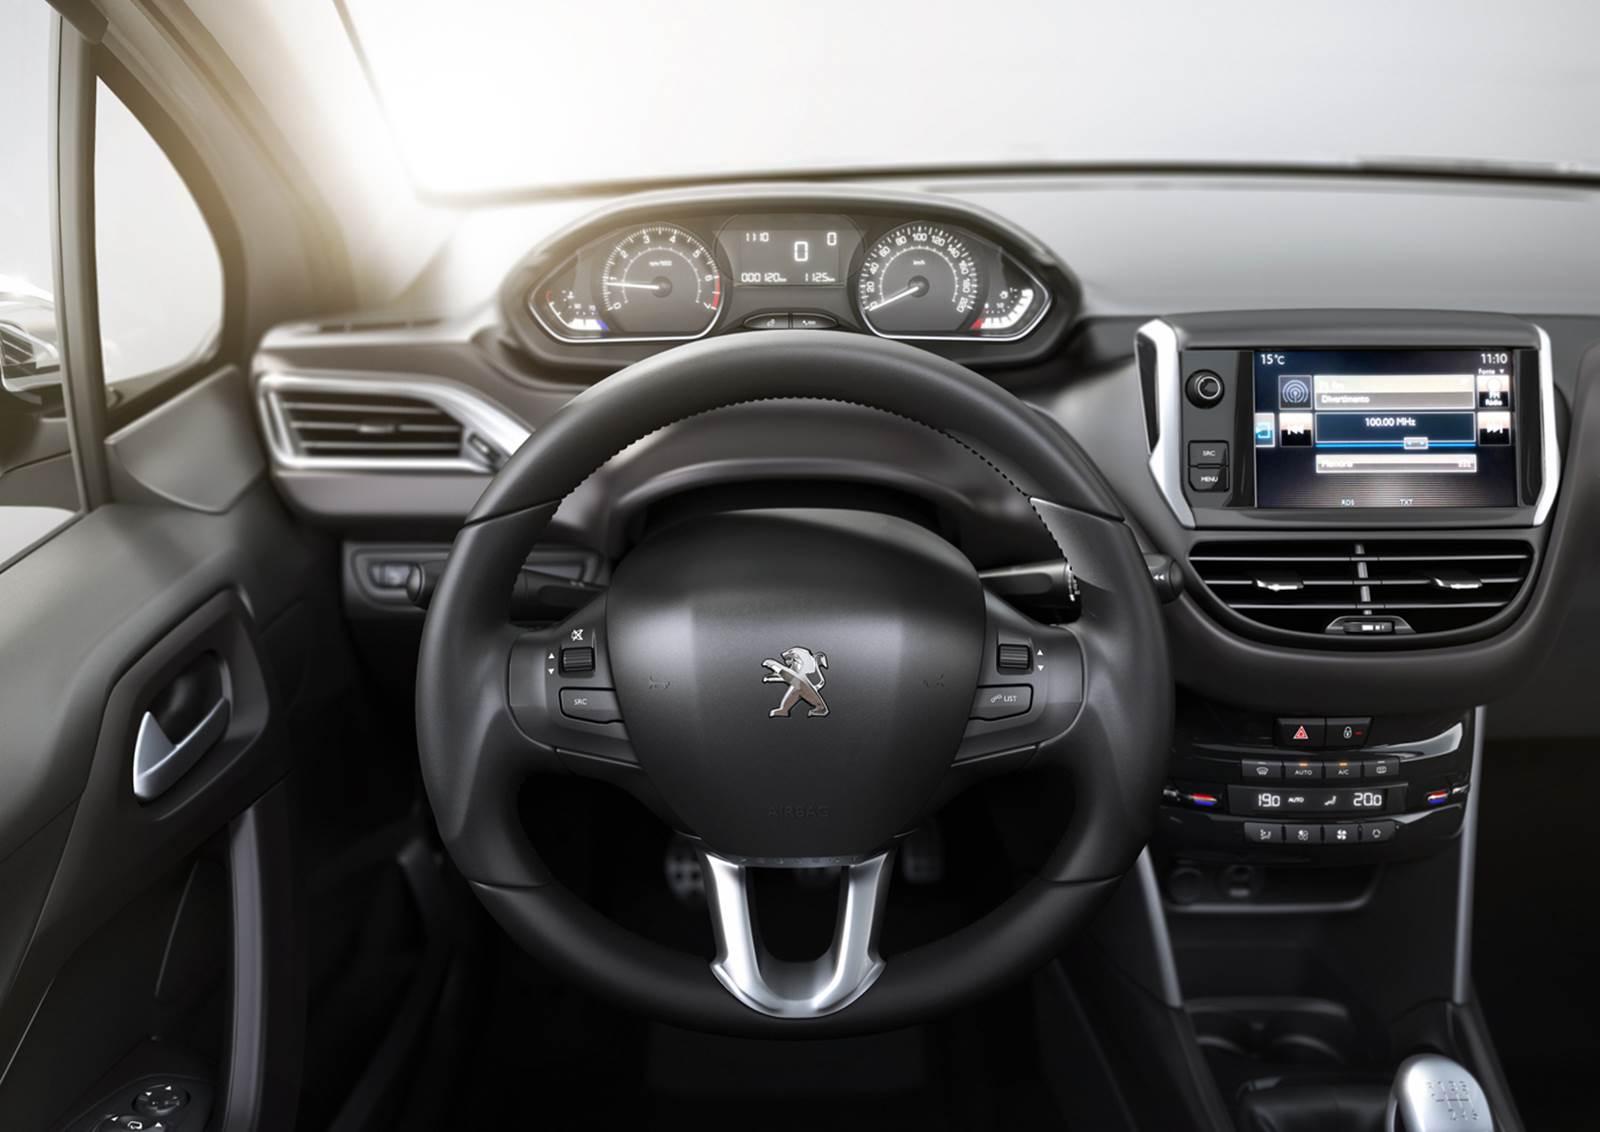 Novo Peugeot 2008 - interior - painel